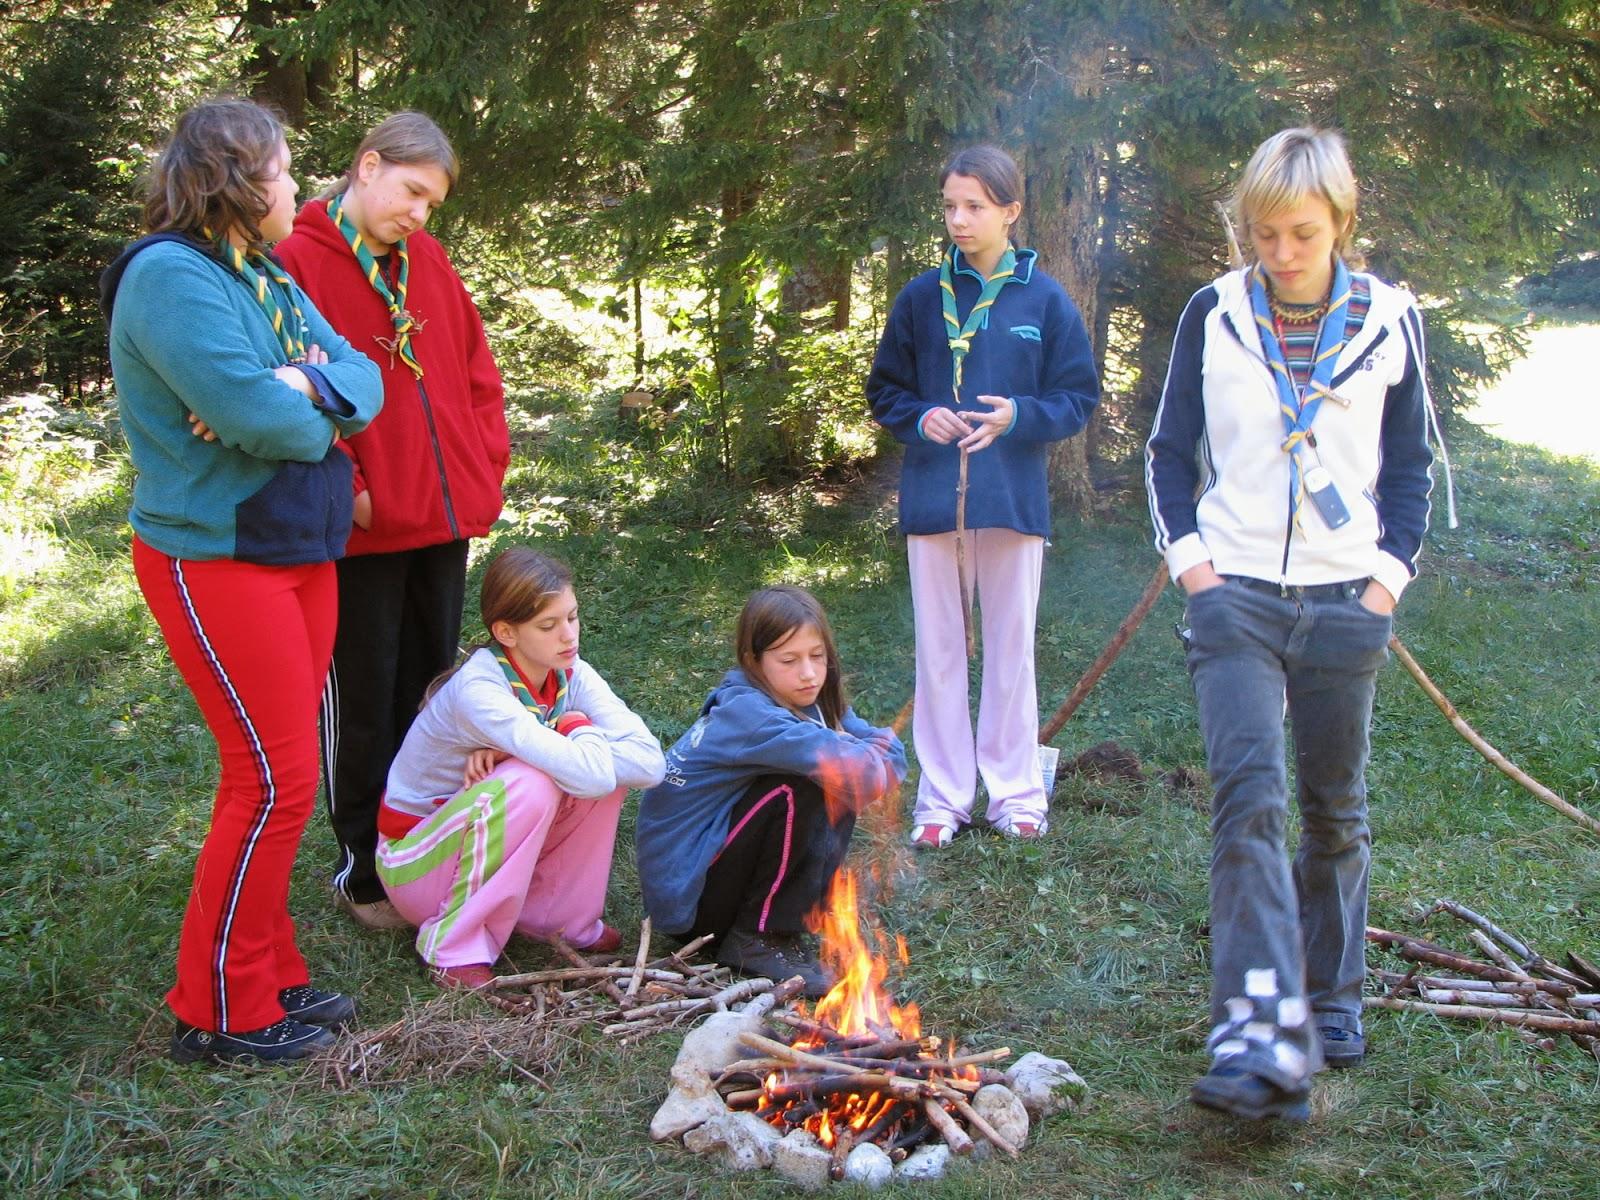 Vodov izlet, Ilirska Bistrica 2005 - Picture%2B163.jpg